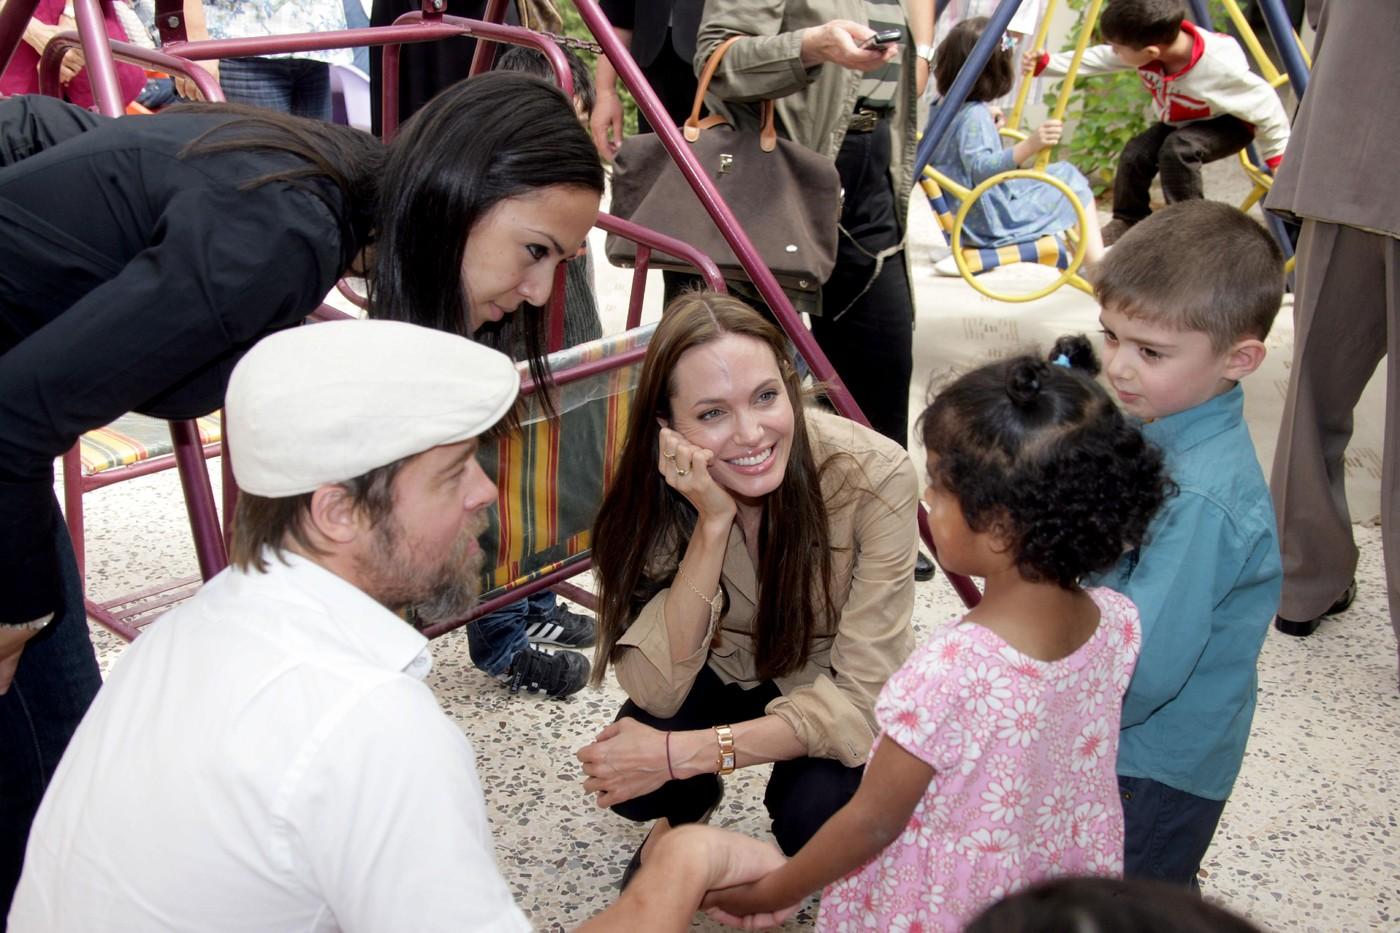 Bratt Pitt et Angelina Jolie aident les orphelins